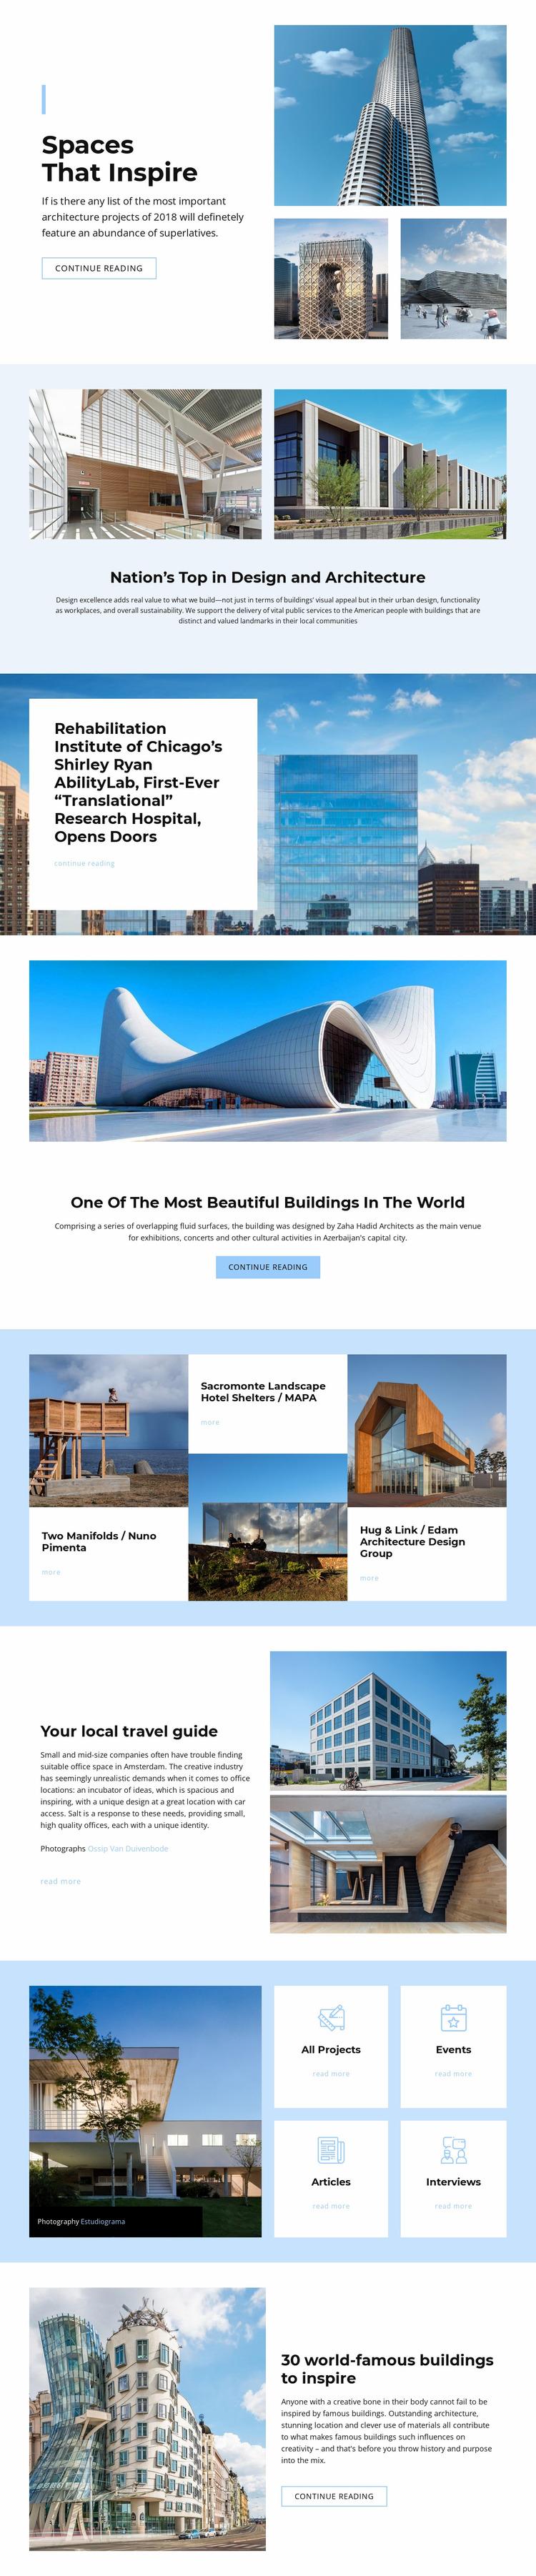 Space-inspired architechture Website Mockup